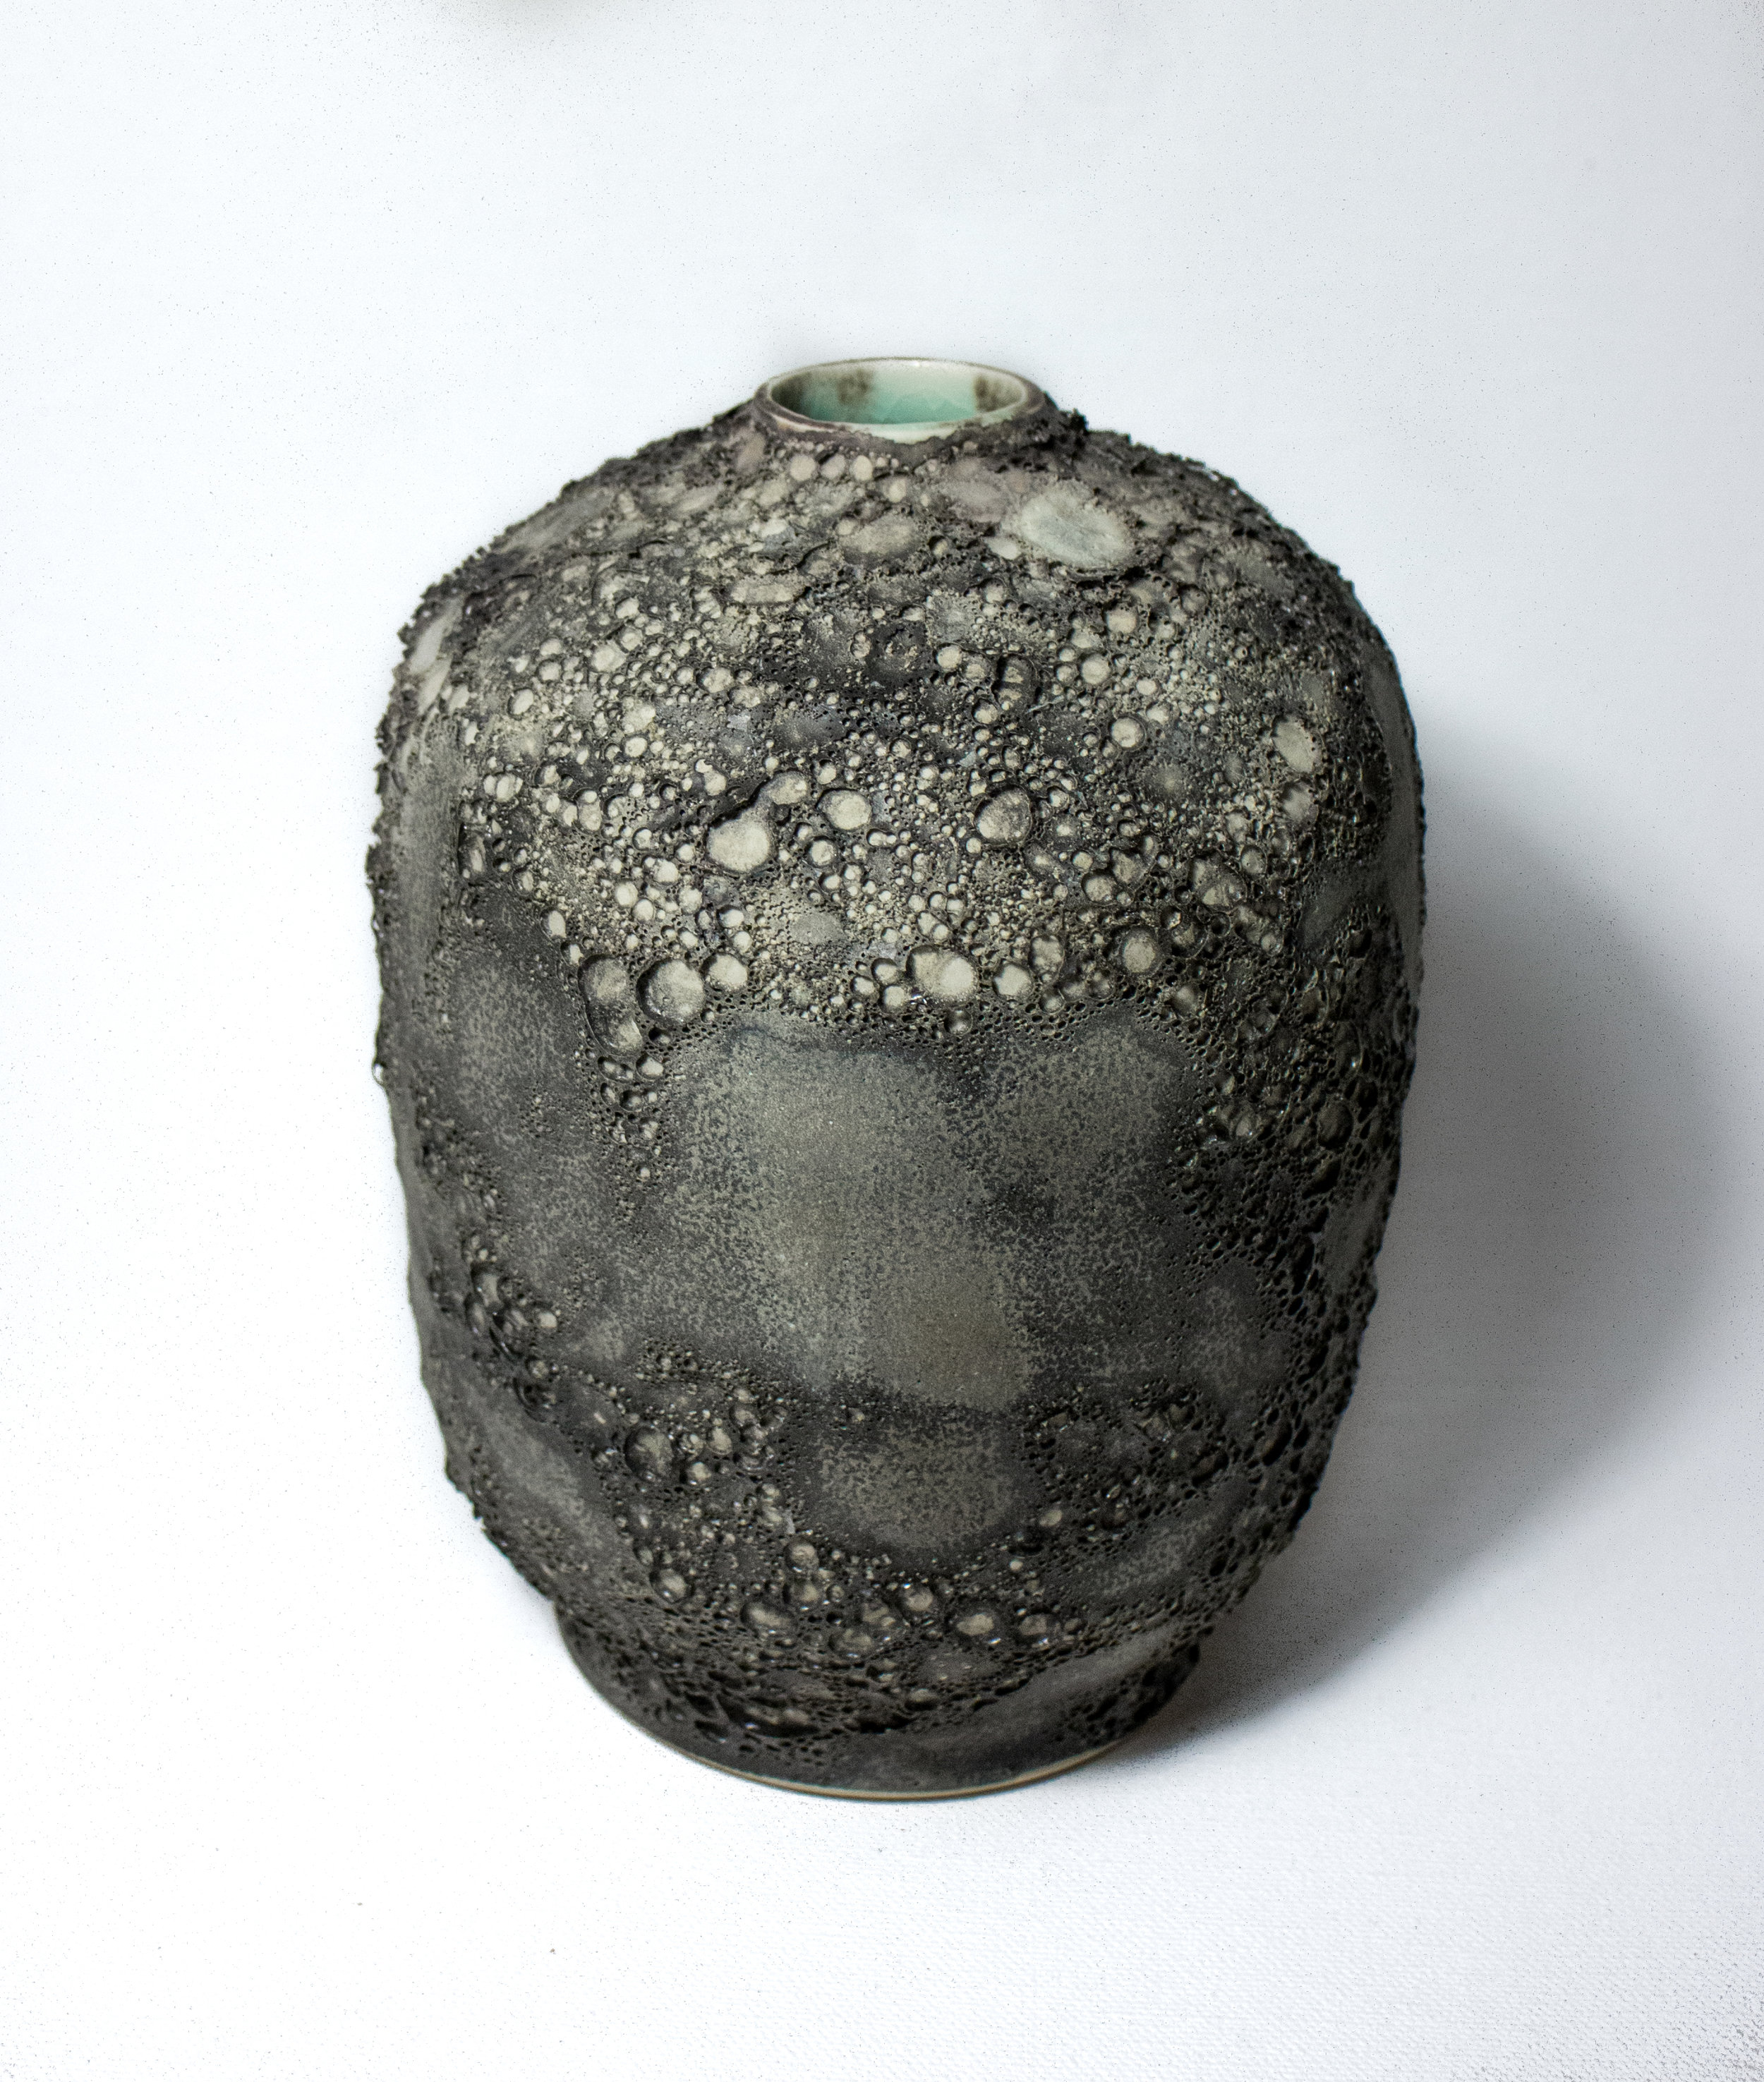 Porcelain Vessel in mars Lava Exterior Glaze Frozen Aqua Interior